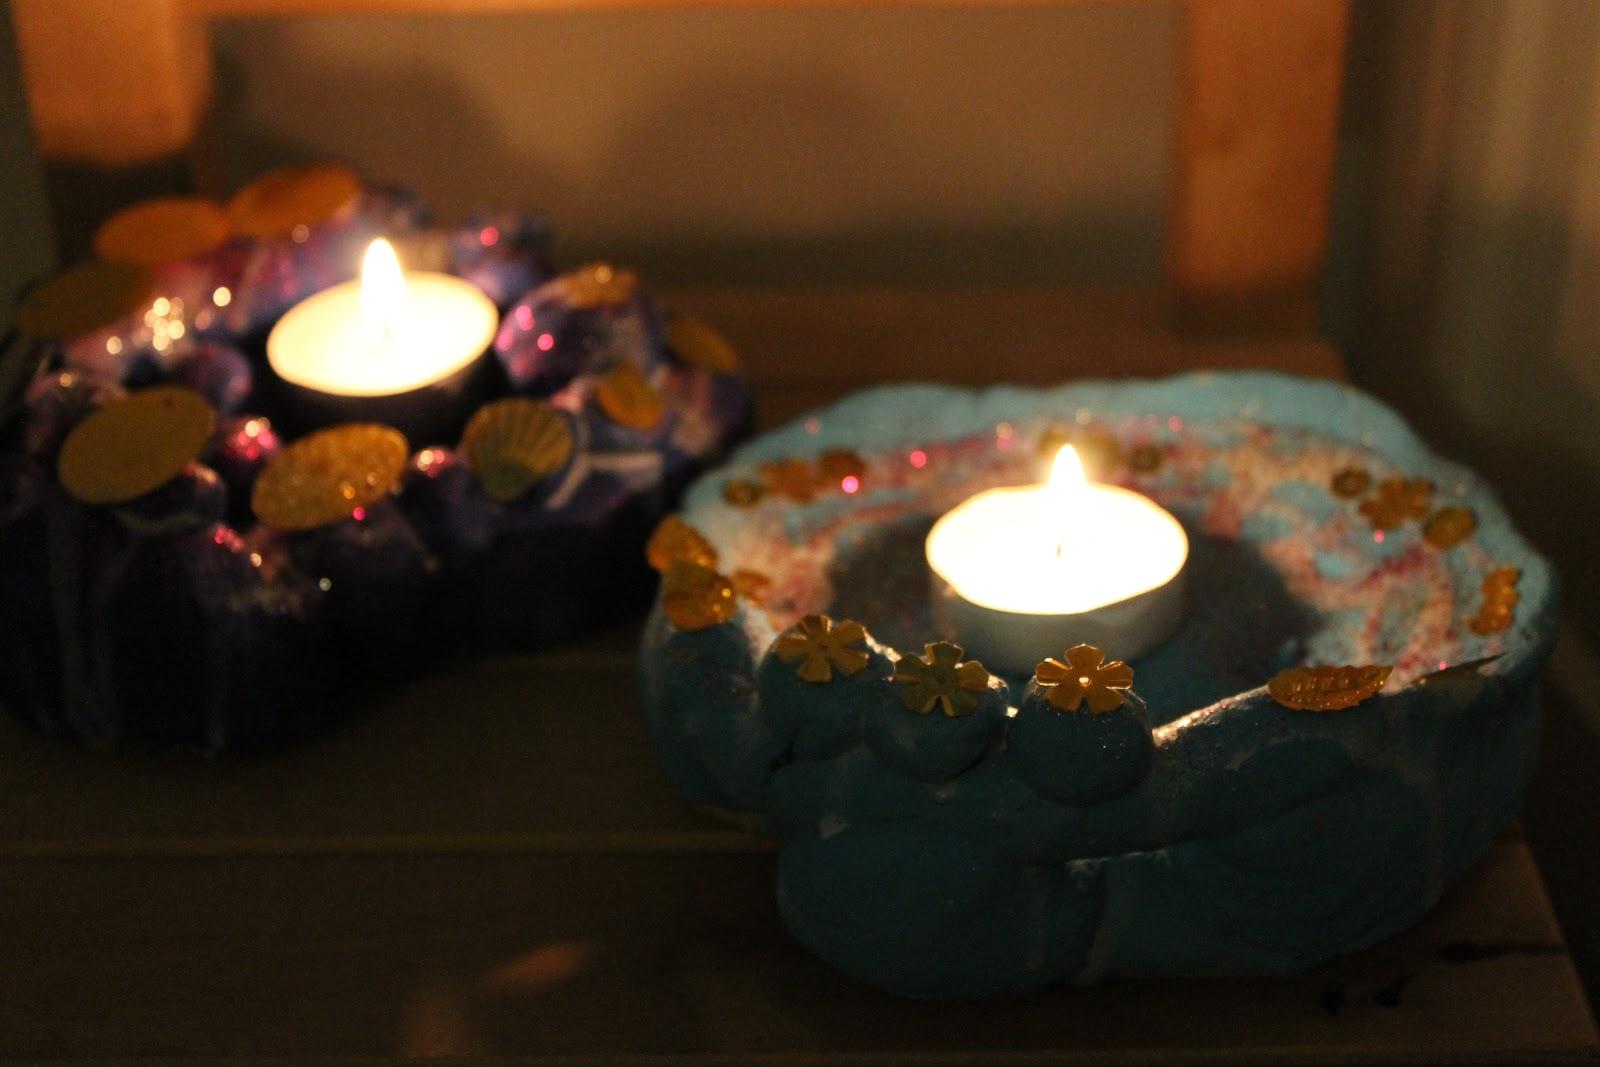 Salt Dough Lamps : Crafty by Nurture: Crafty Tutorial - Salt Dough Decorations and Diwali Lamps